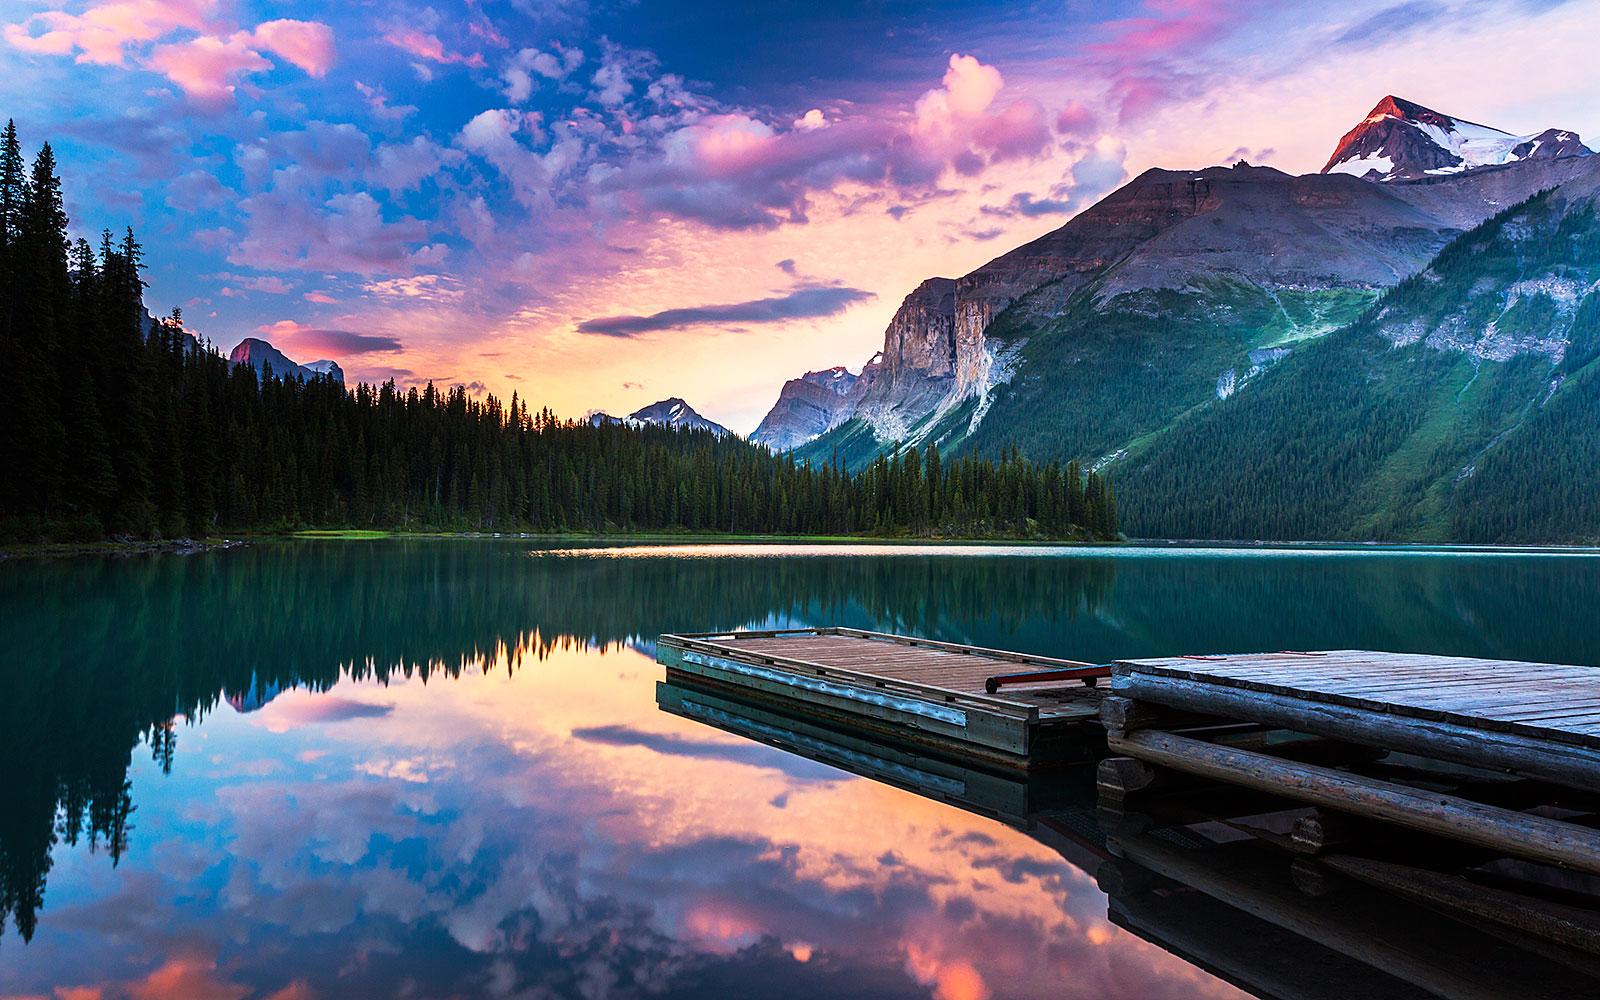 Dawn at Maligne Lake